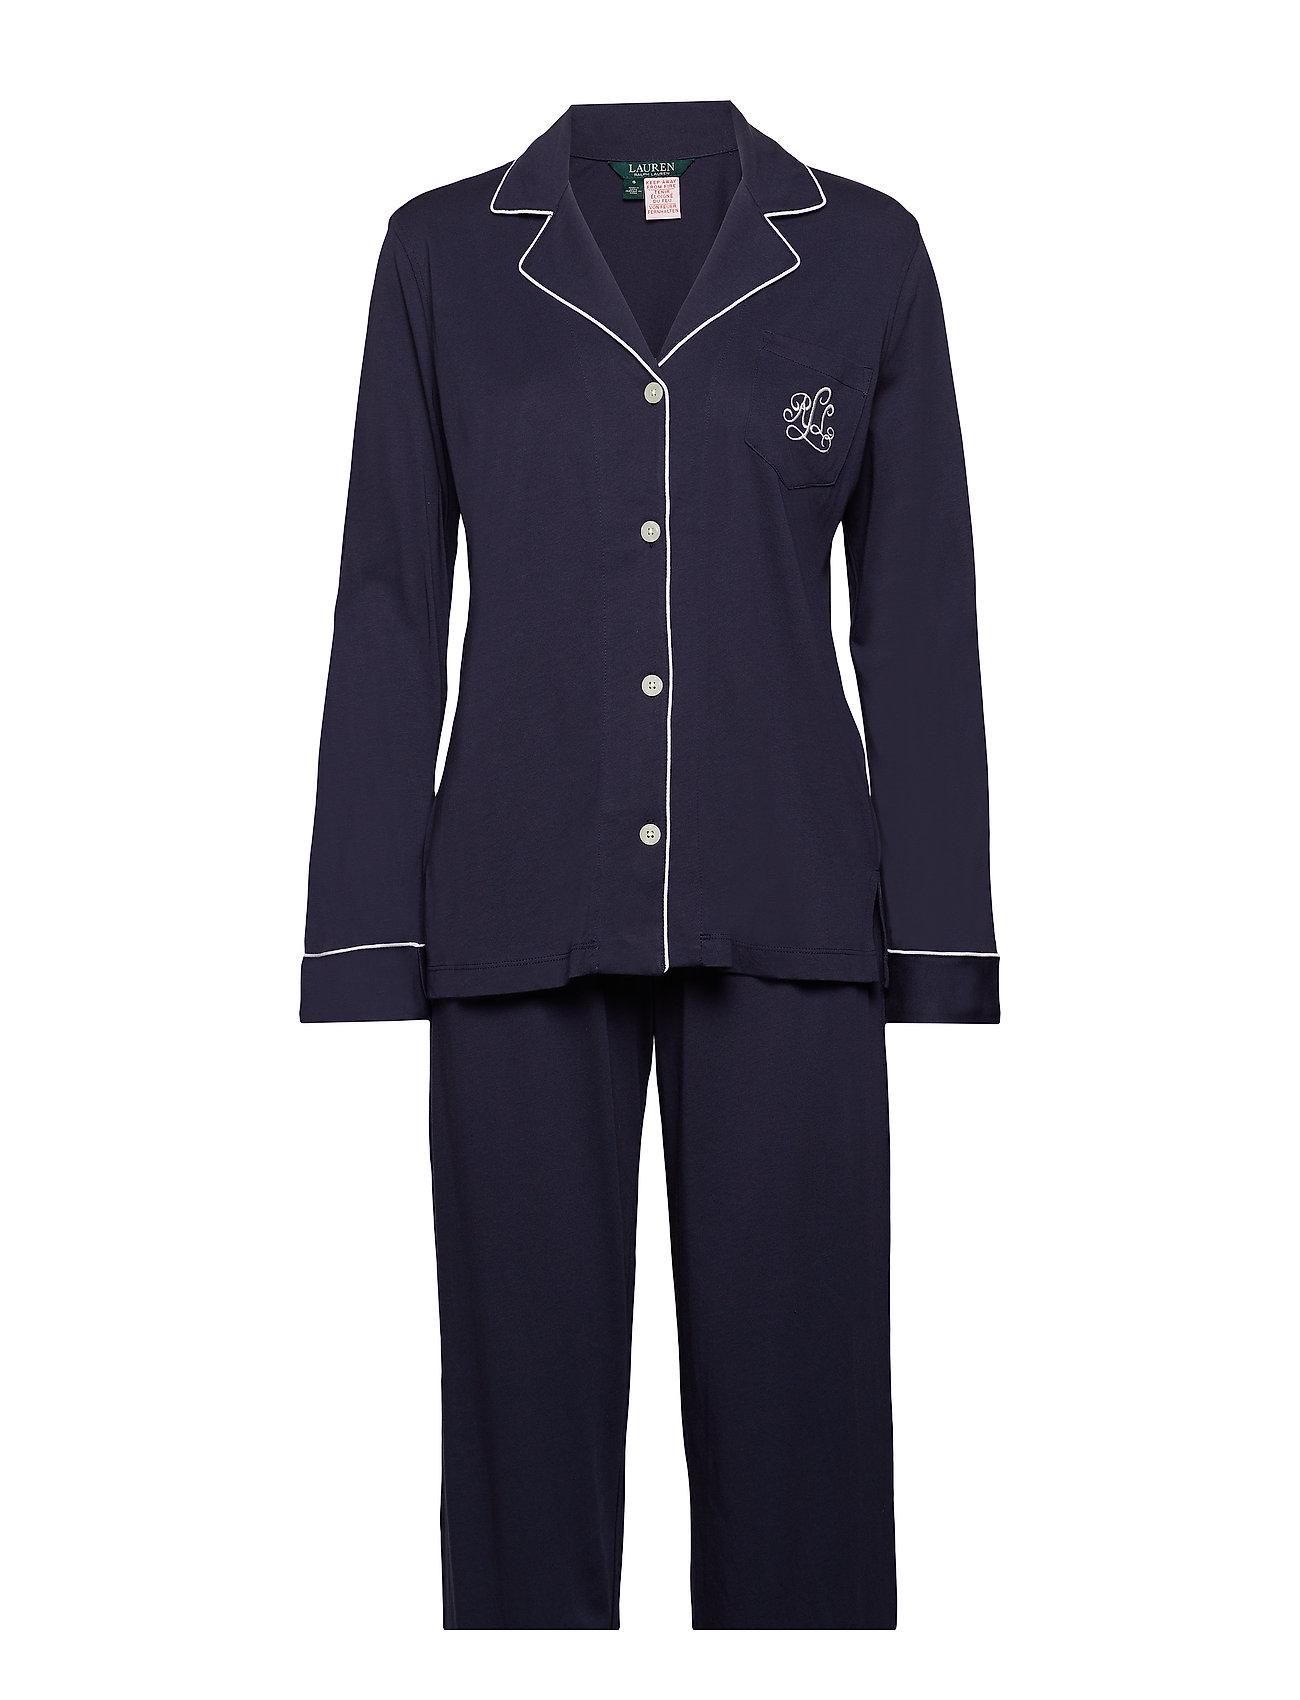 Lauren Ralph Lauren Homewear LRL HAMMOND KNIT COLLAR PJ SET - WINDSOR NAVY